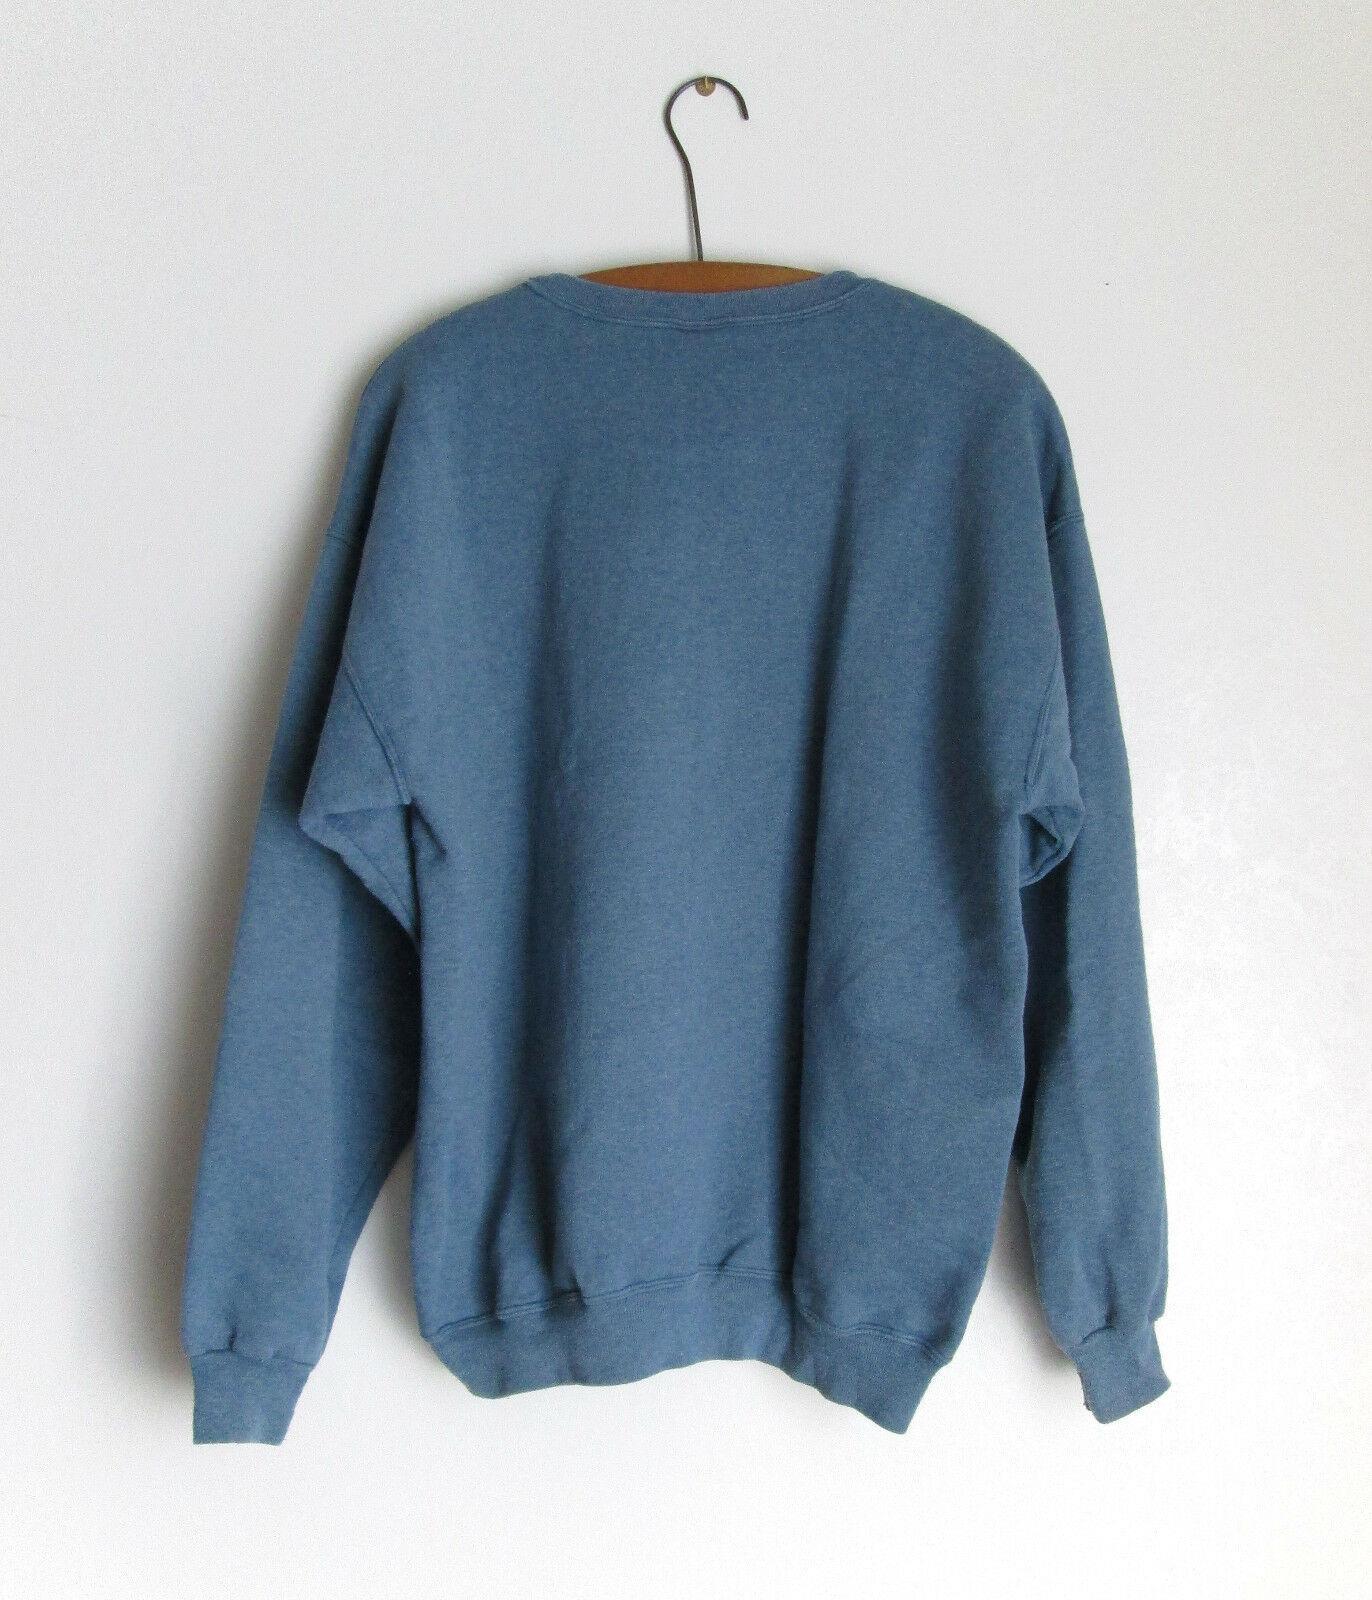 Miami Retro Faded Graphic Blue Sweatshirt Cotton Blend Size Large Champion image 5